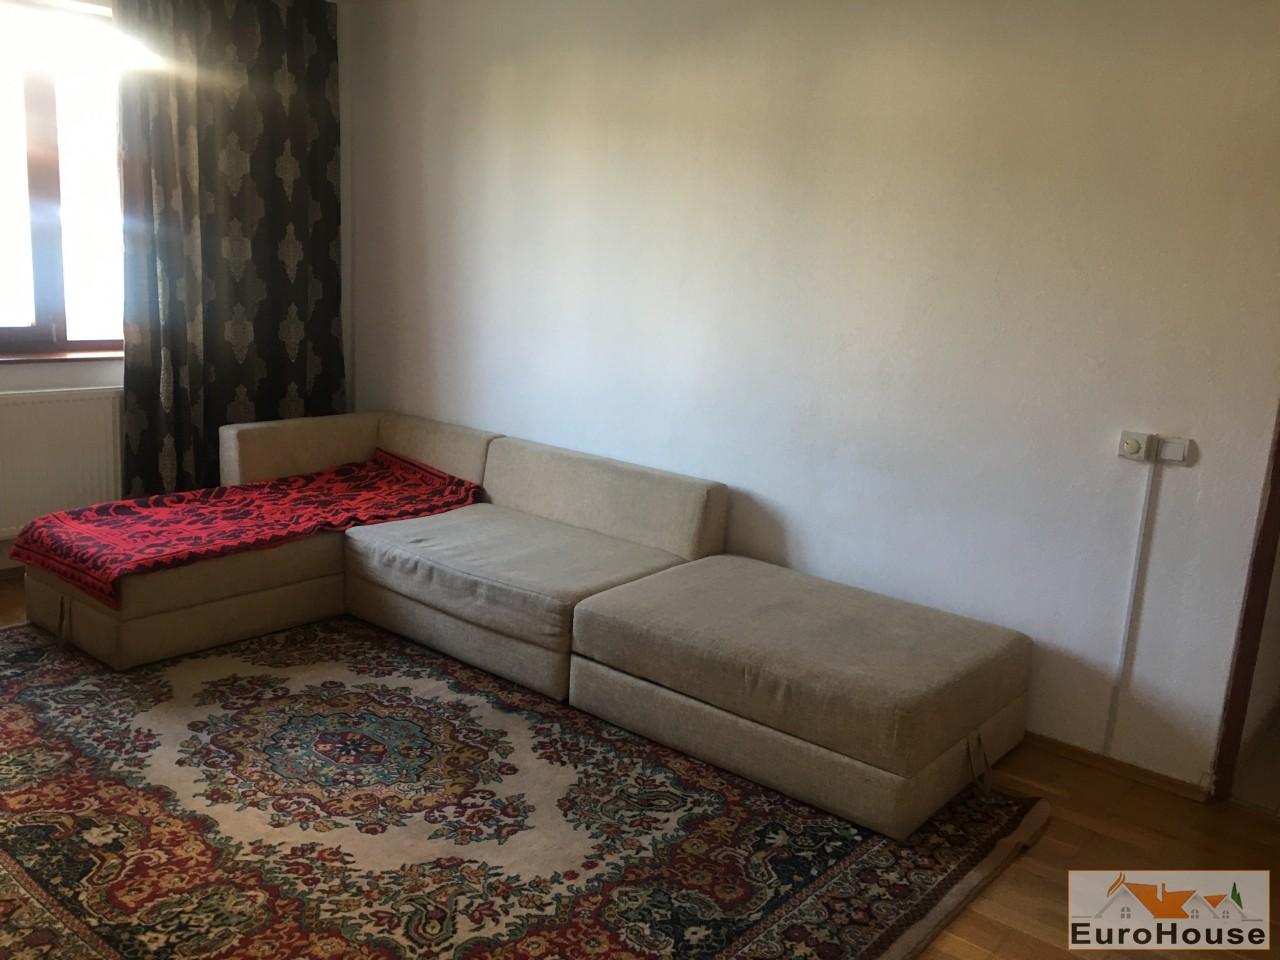 Apartament de vanzare 3 camere  Alba Iulia-34494-